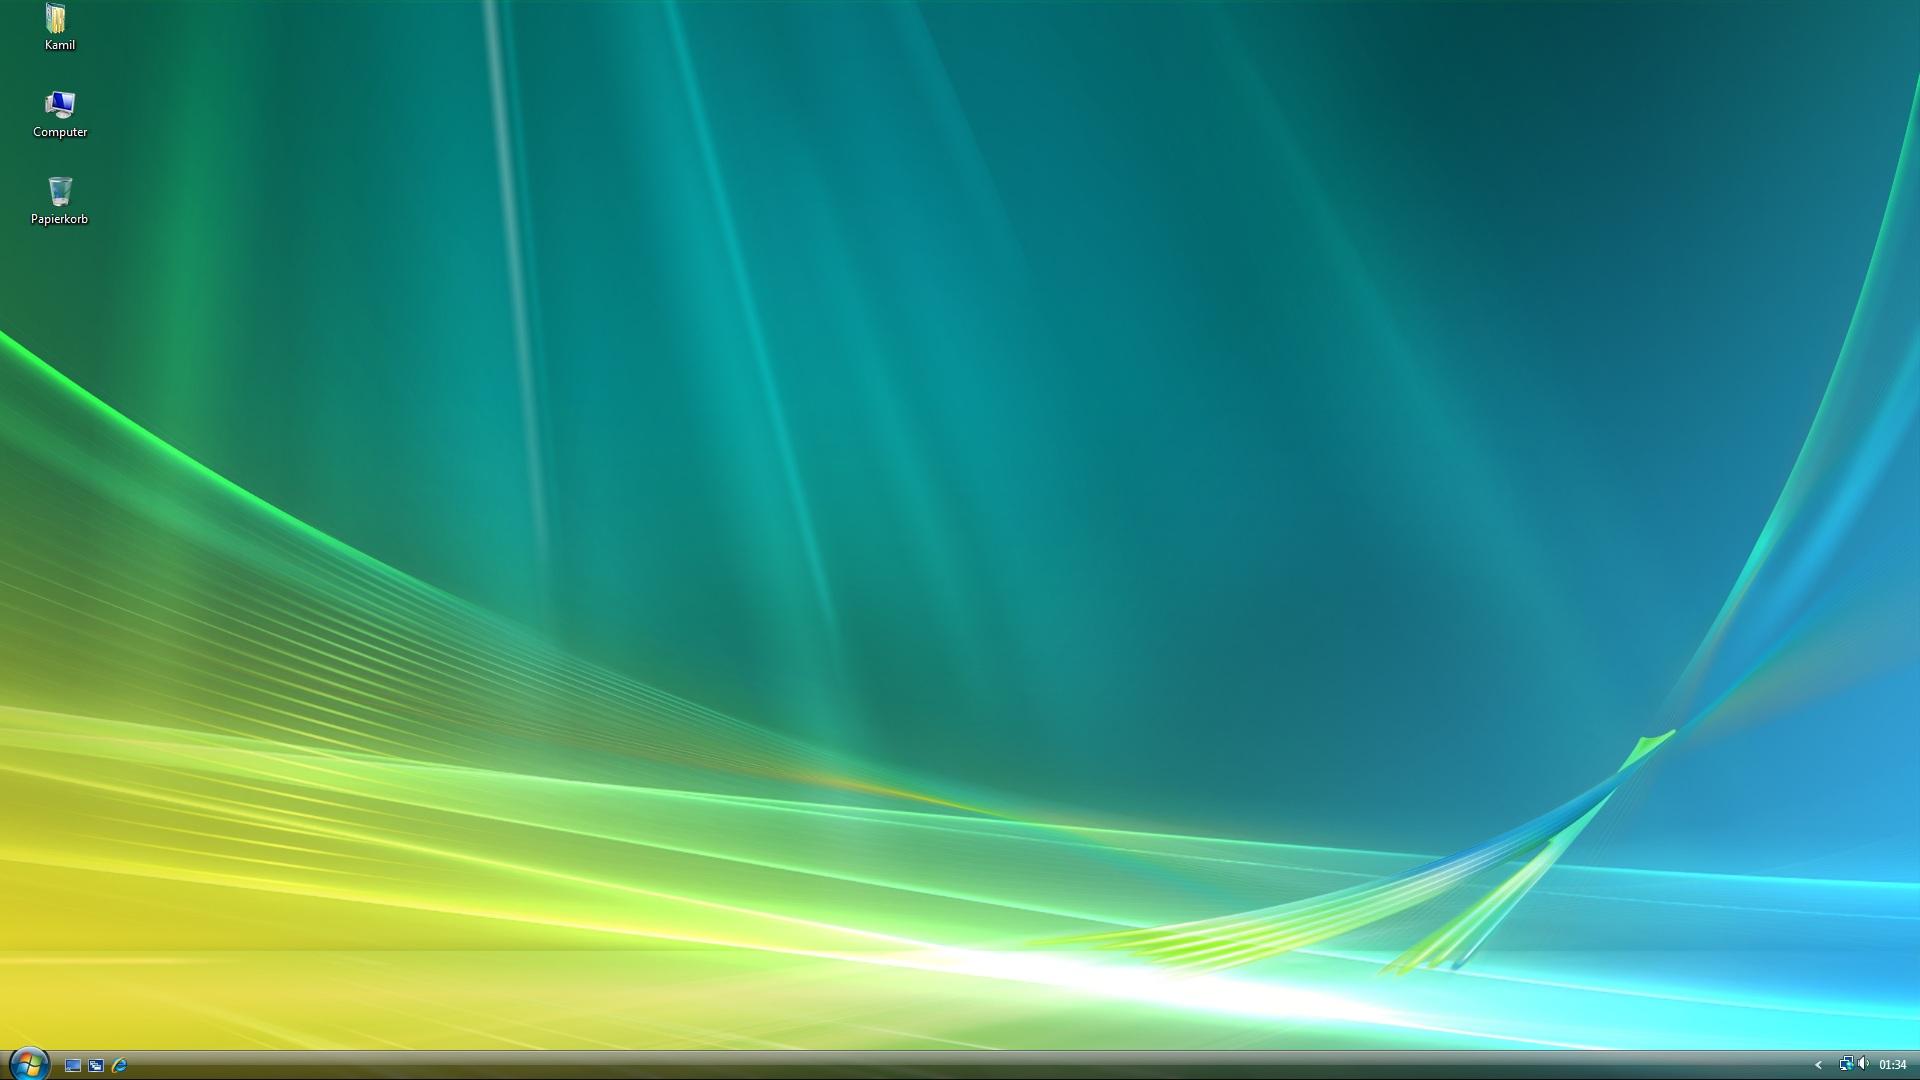 Windows vista ultimate for free 32 bit64 bit retail version 32 64 bit